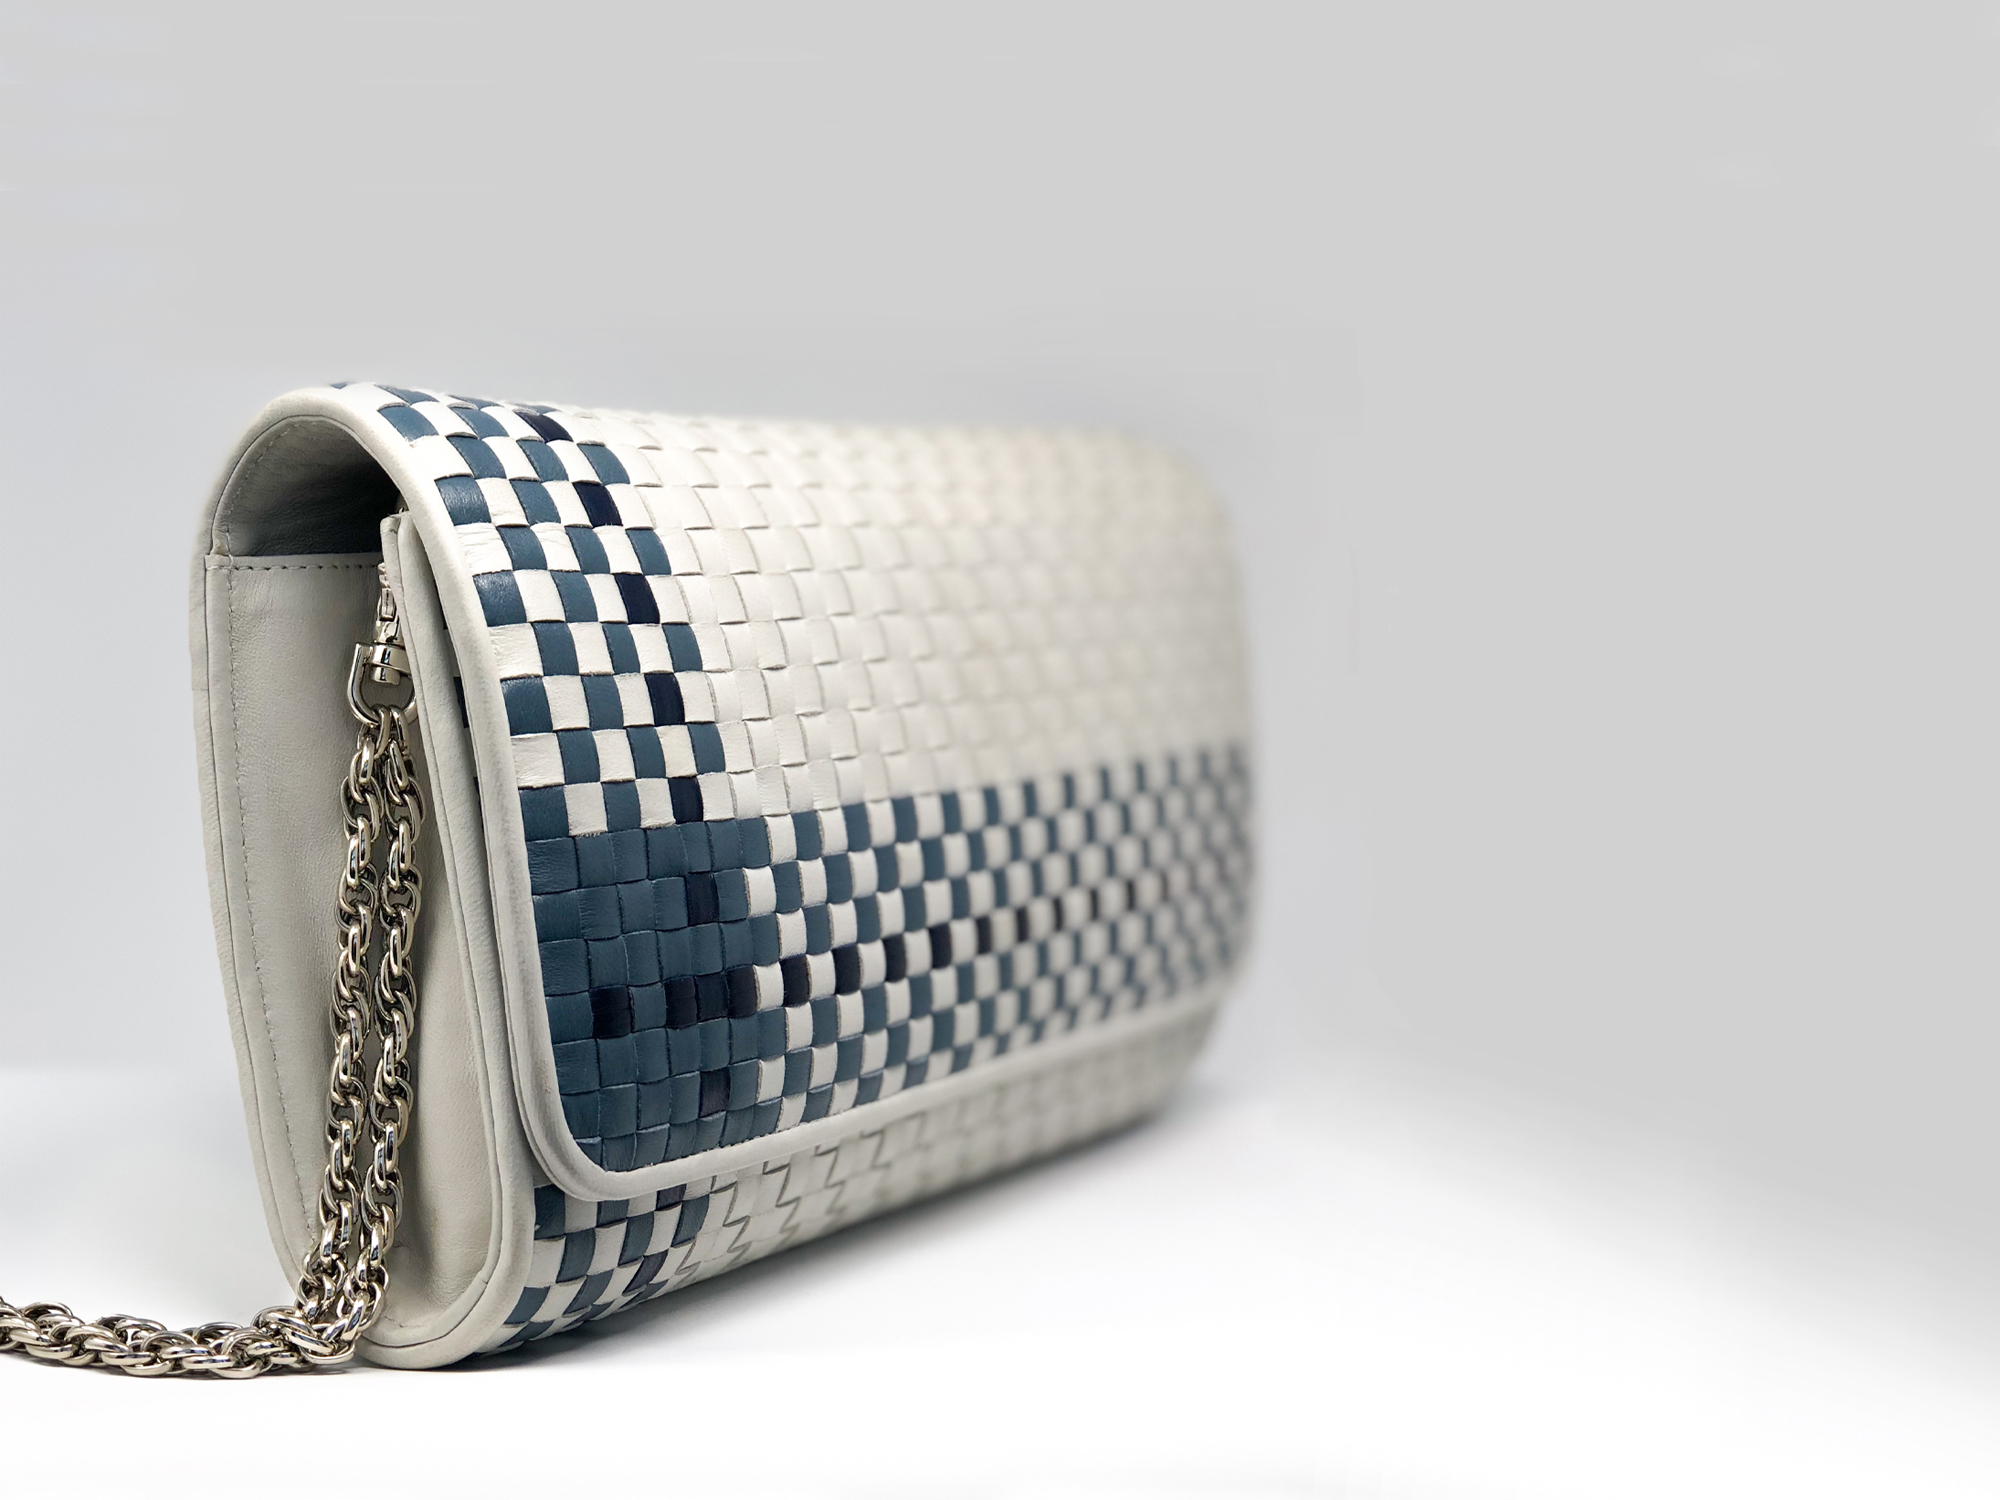 shoulderbag_woven_lambskin_blue_gray_crossbody.jpg